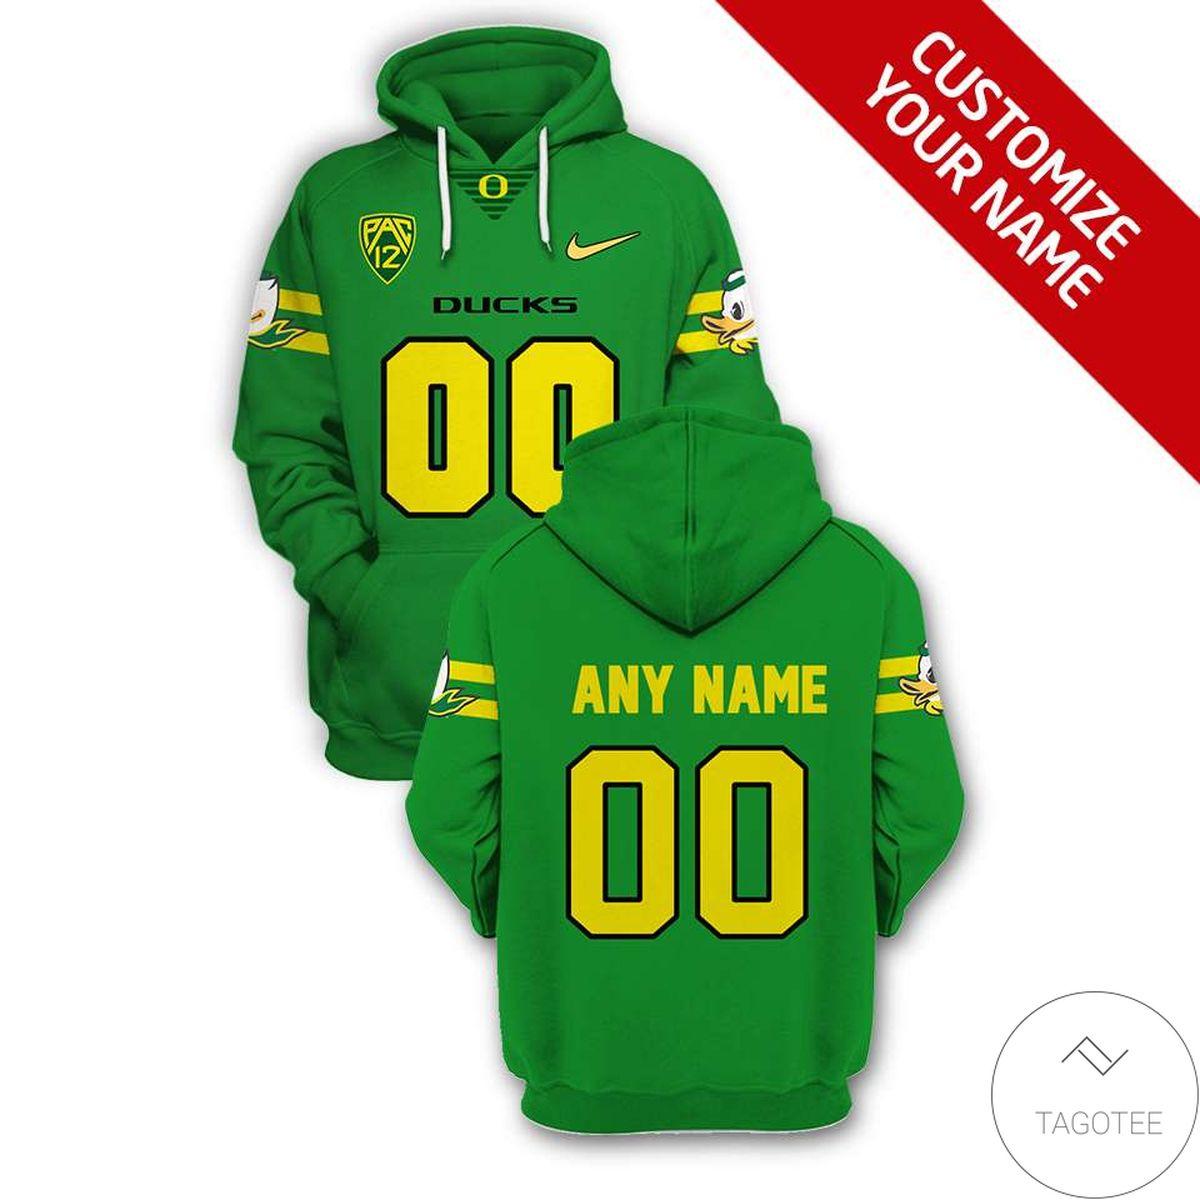 Personalized Oregon Ducks Branded Team Unisex 3d Hoodie